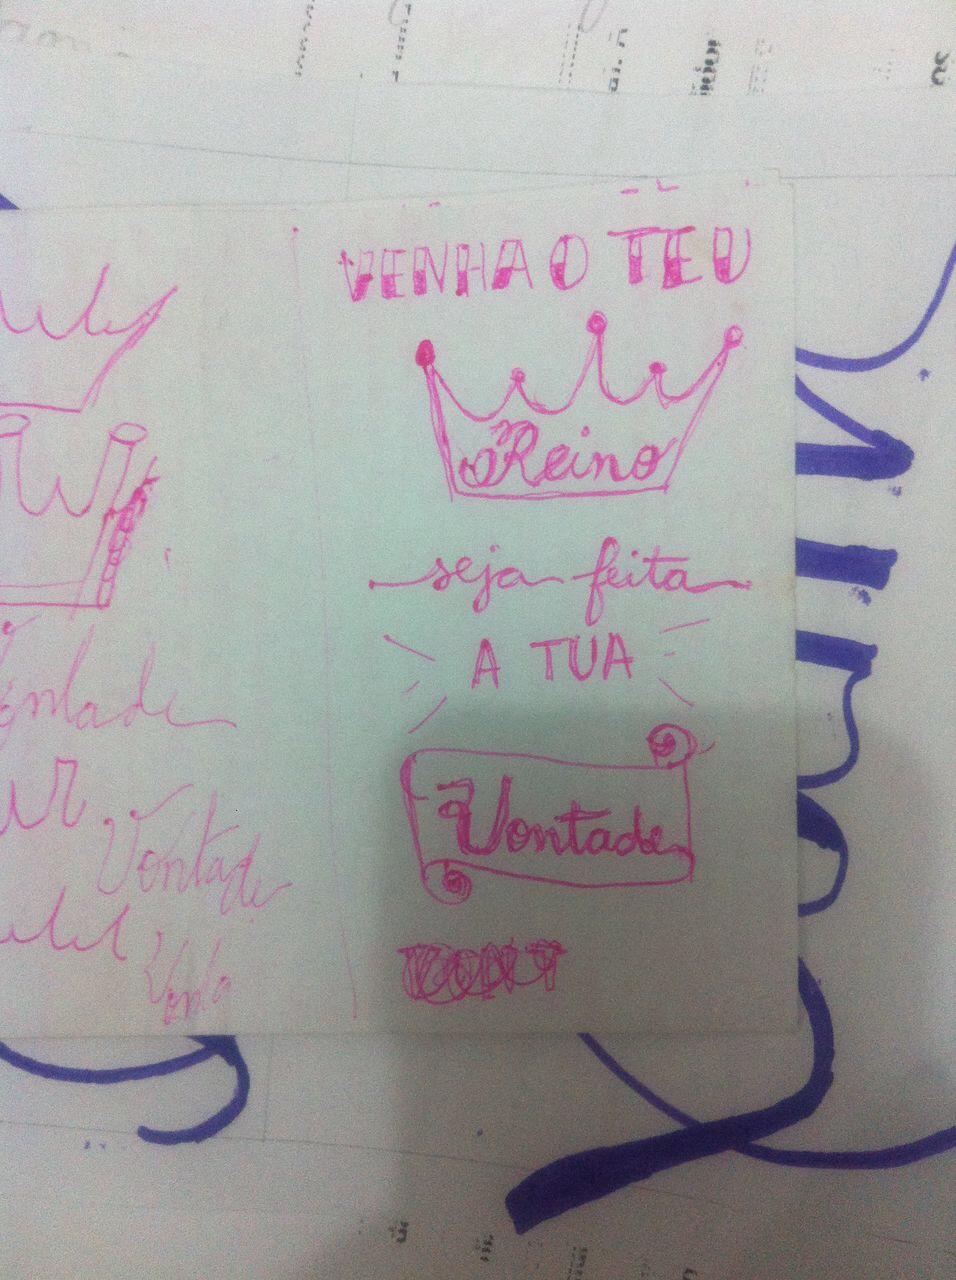 Lettering A Arte De Desenhar Letras Tamaravilhosamente